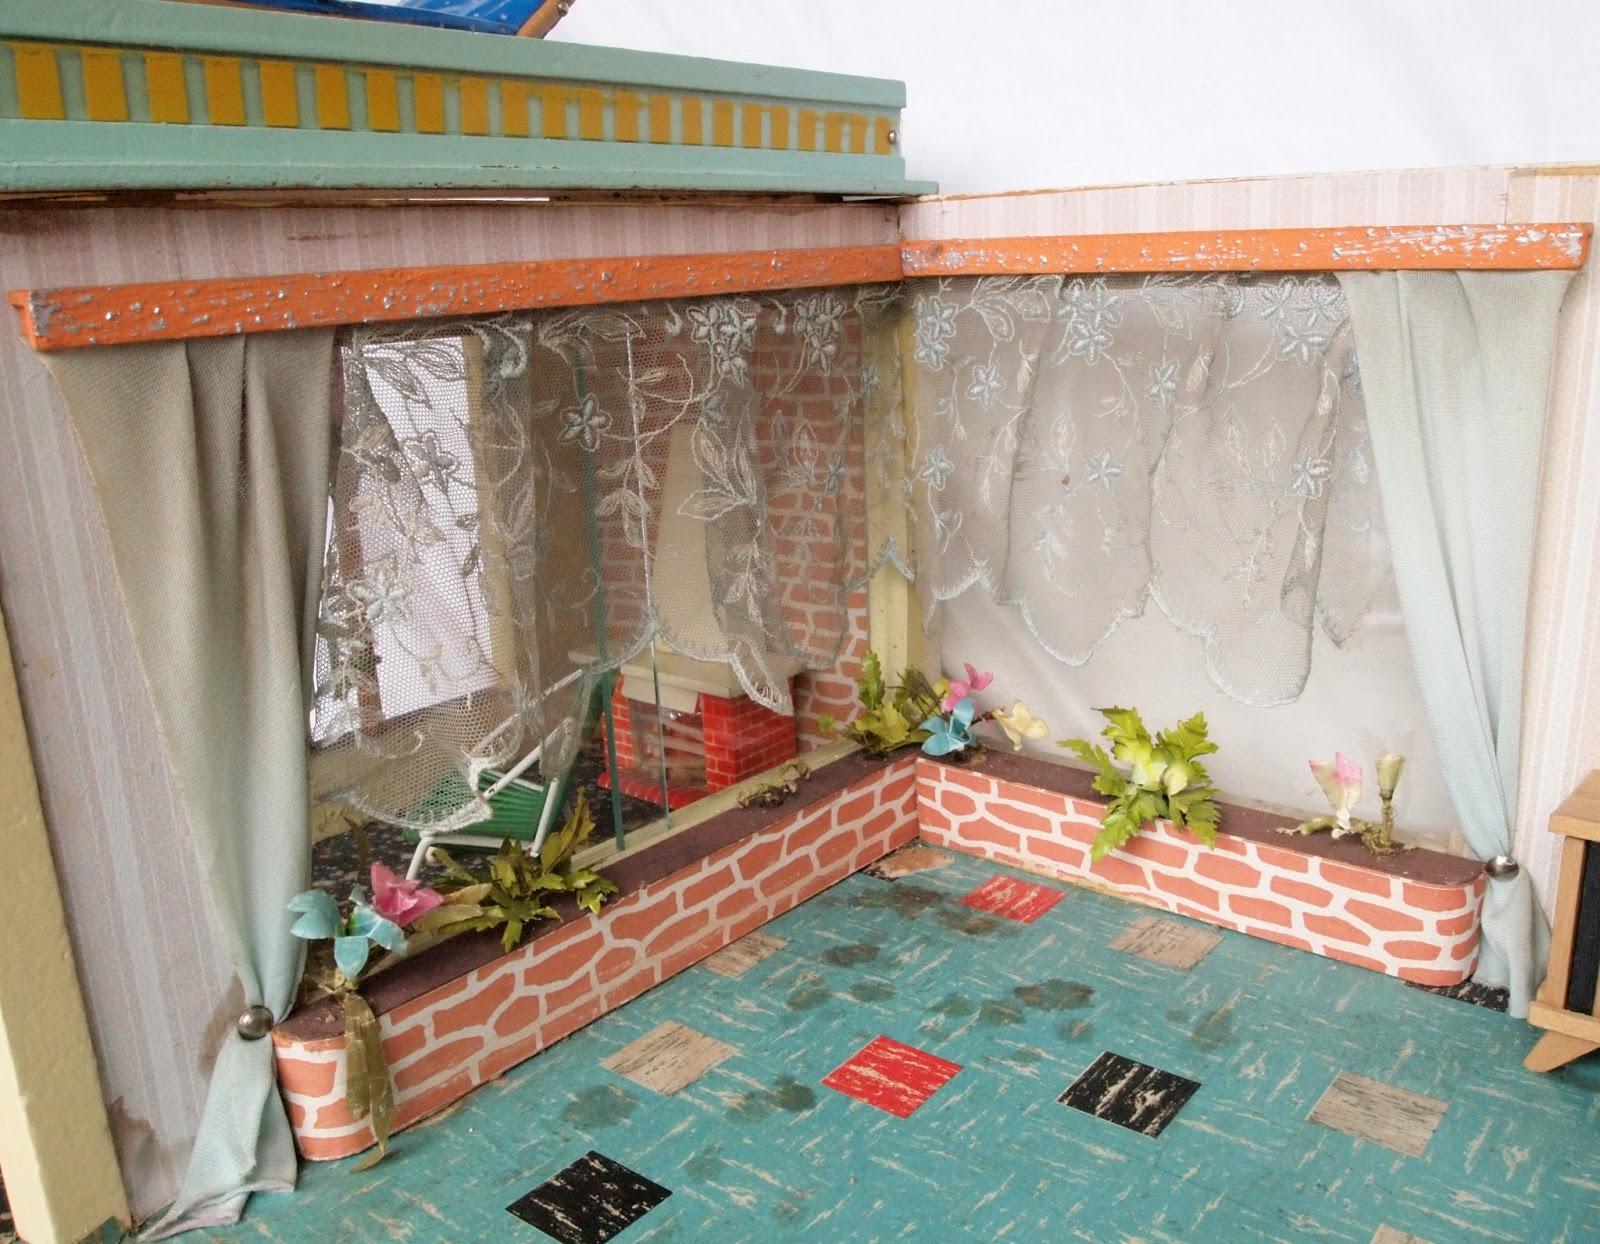 diepuppenstubensammlerin blumenfenster flower windows. Black Bedroom Furniture Sets. Home Design Ideas